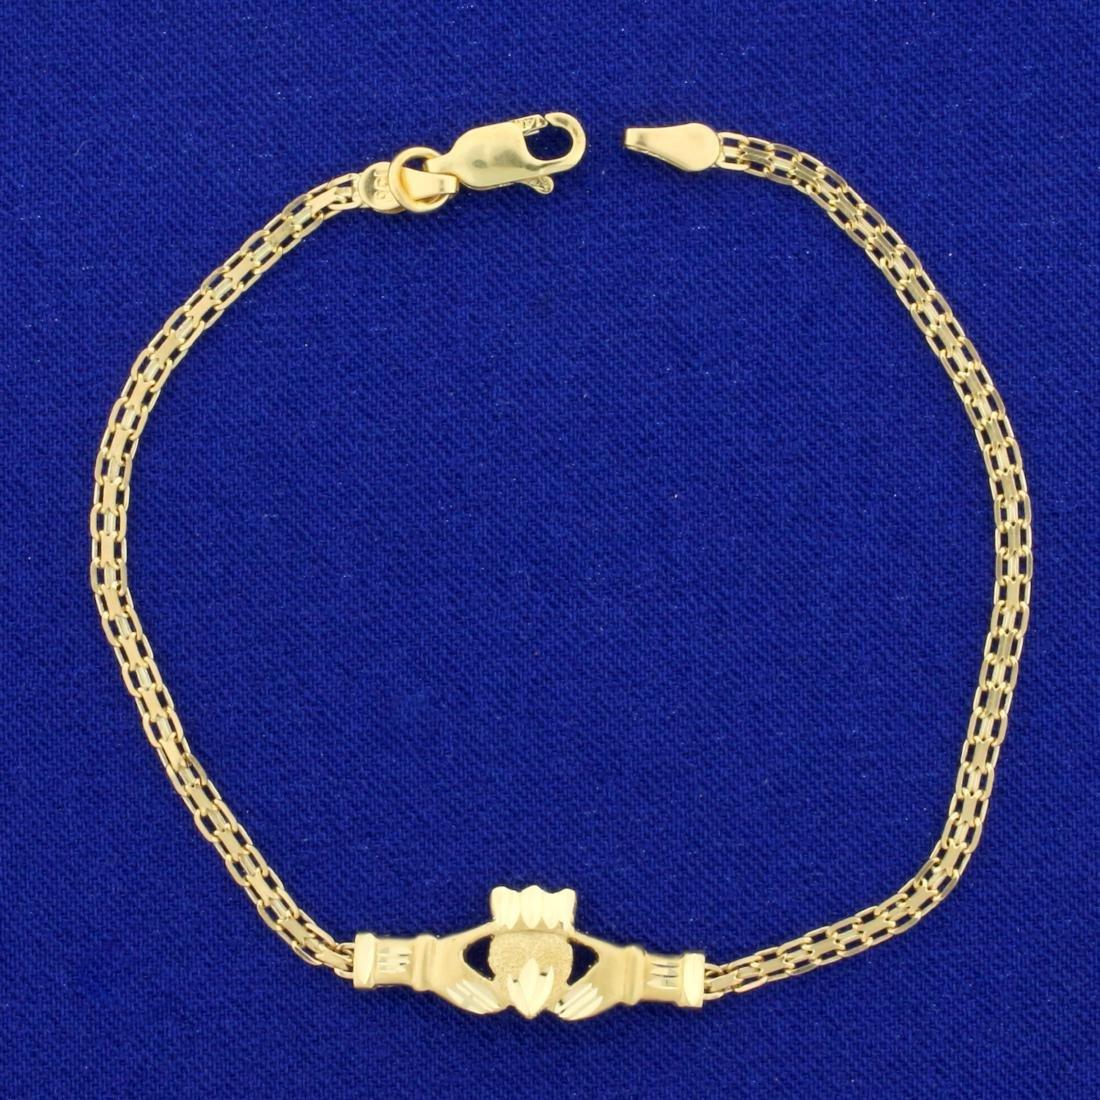 Diamond Cut Claddagh Bismarck Link Bracelet in 14K